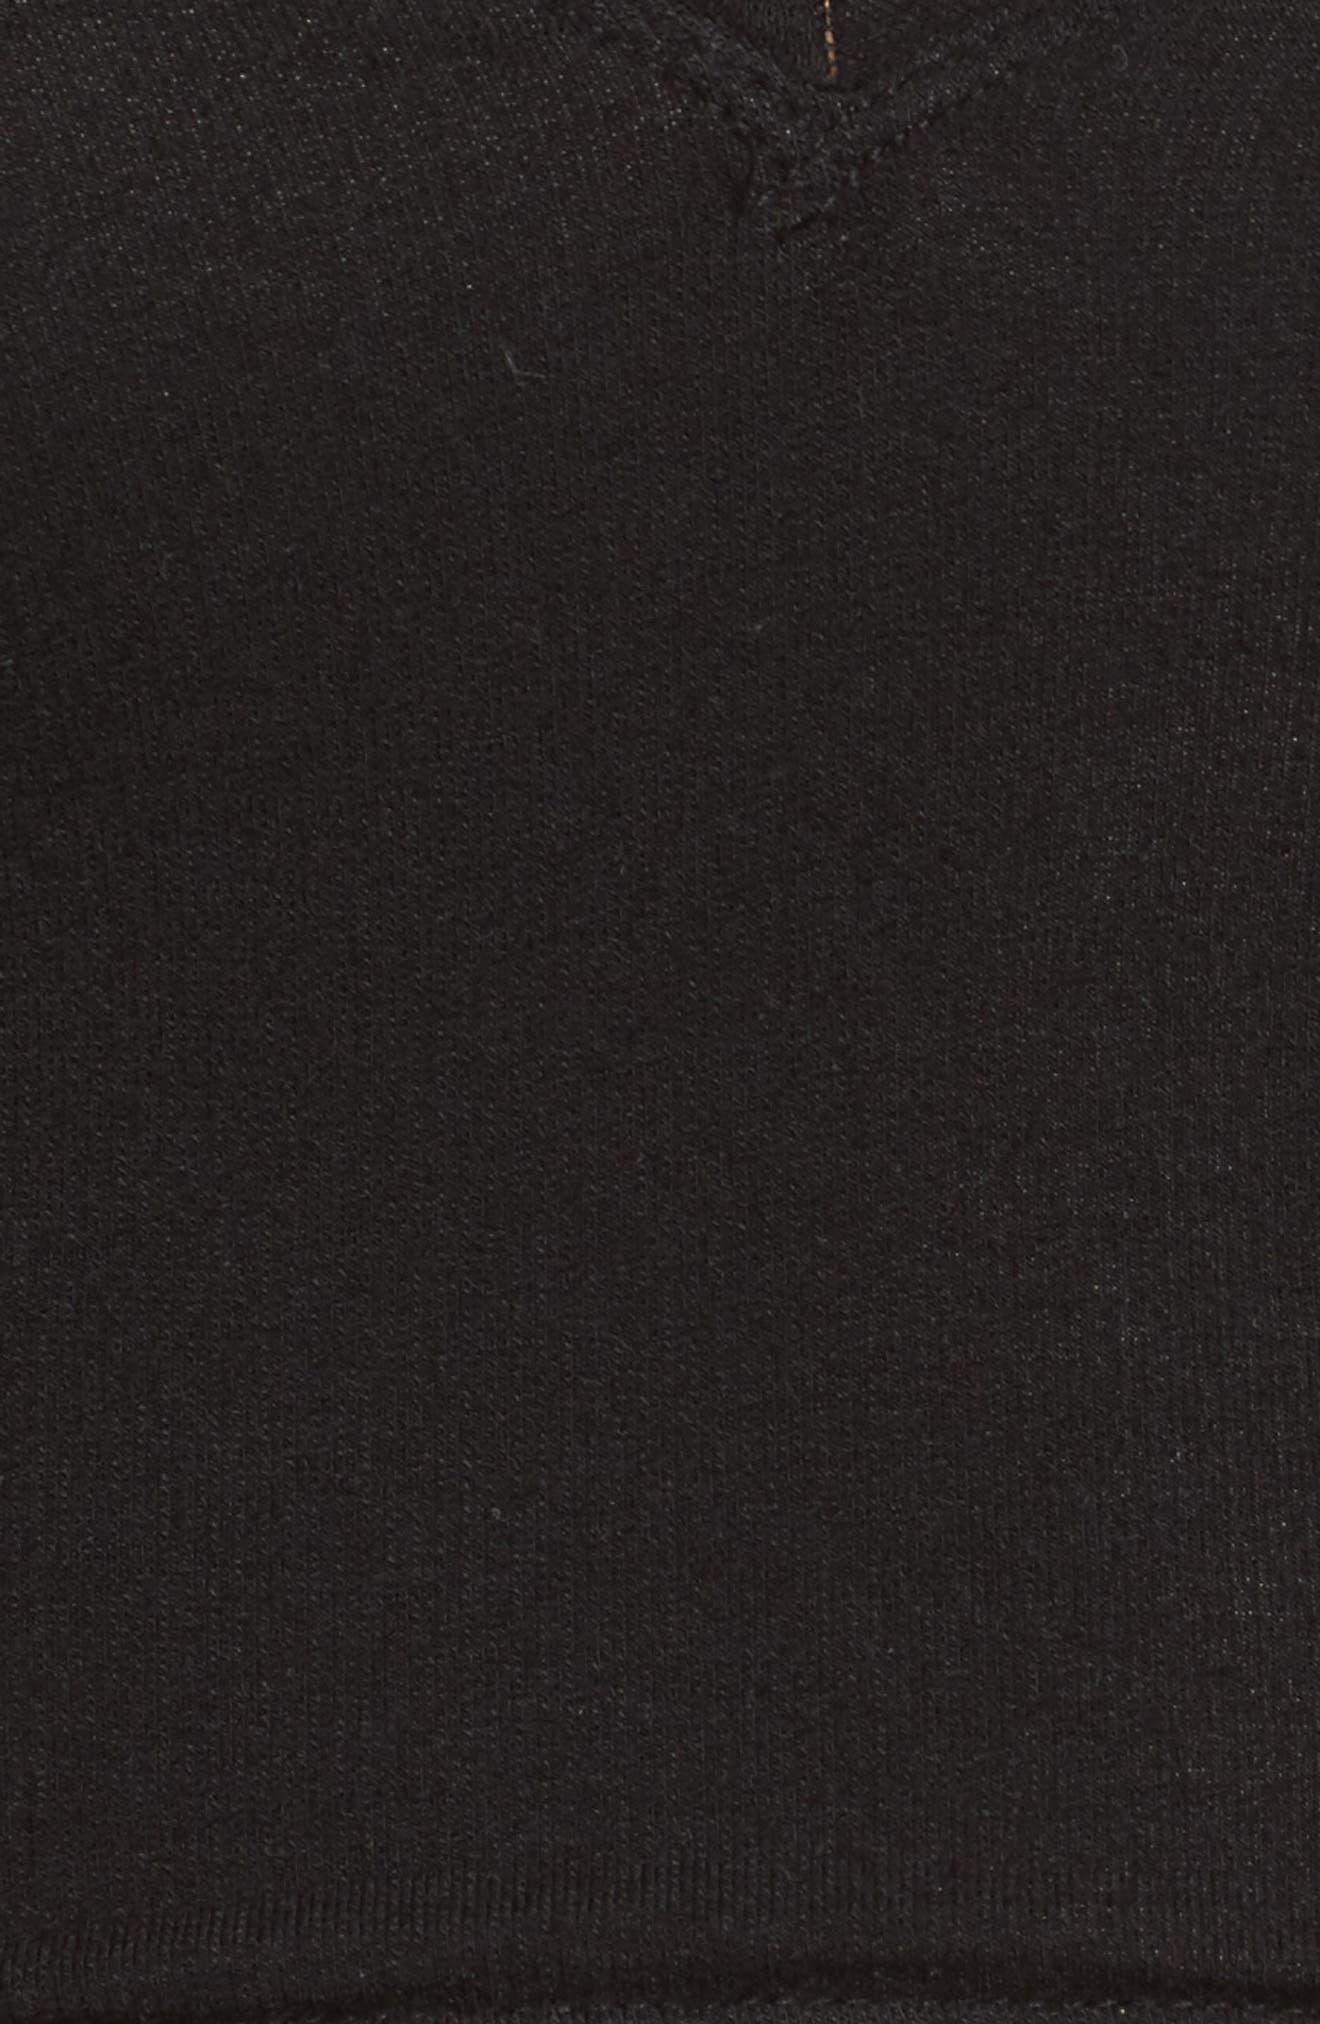 Intimately Jesse Bra,                             Alternate thumbnail 7, color,                             Black